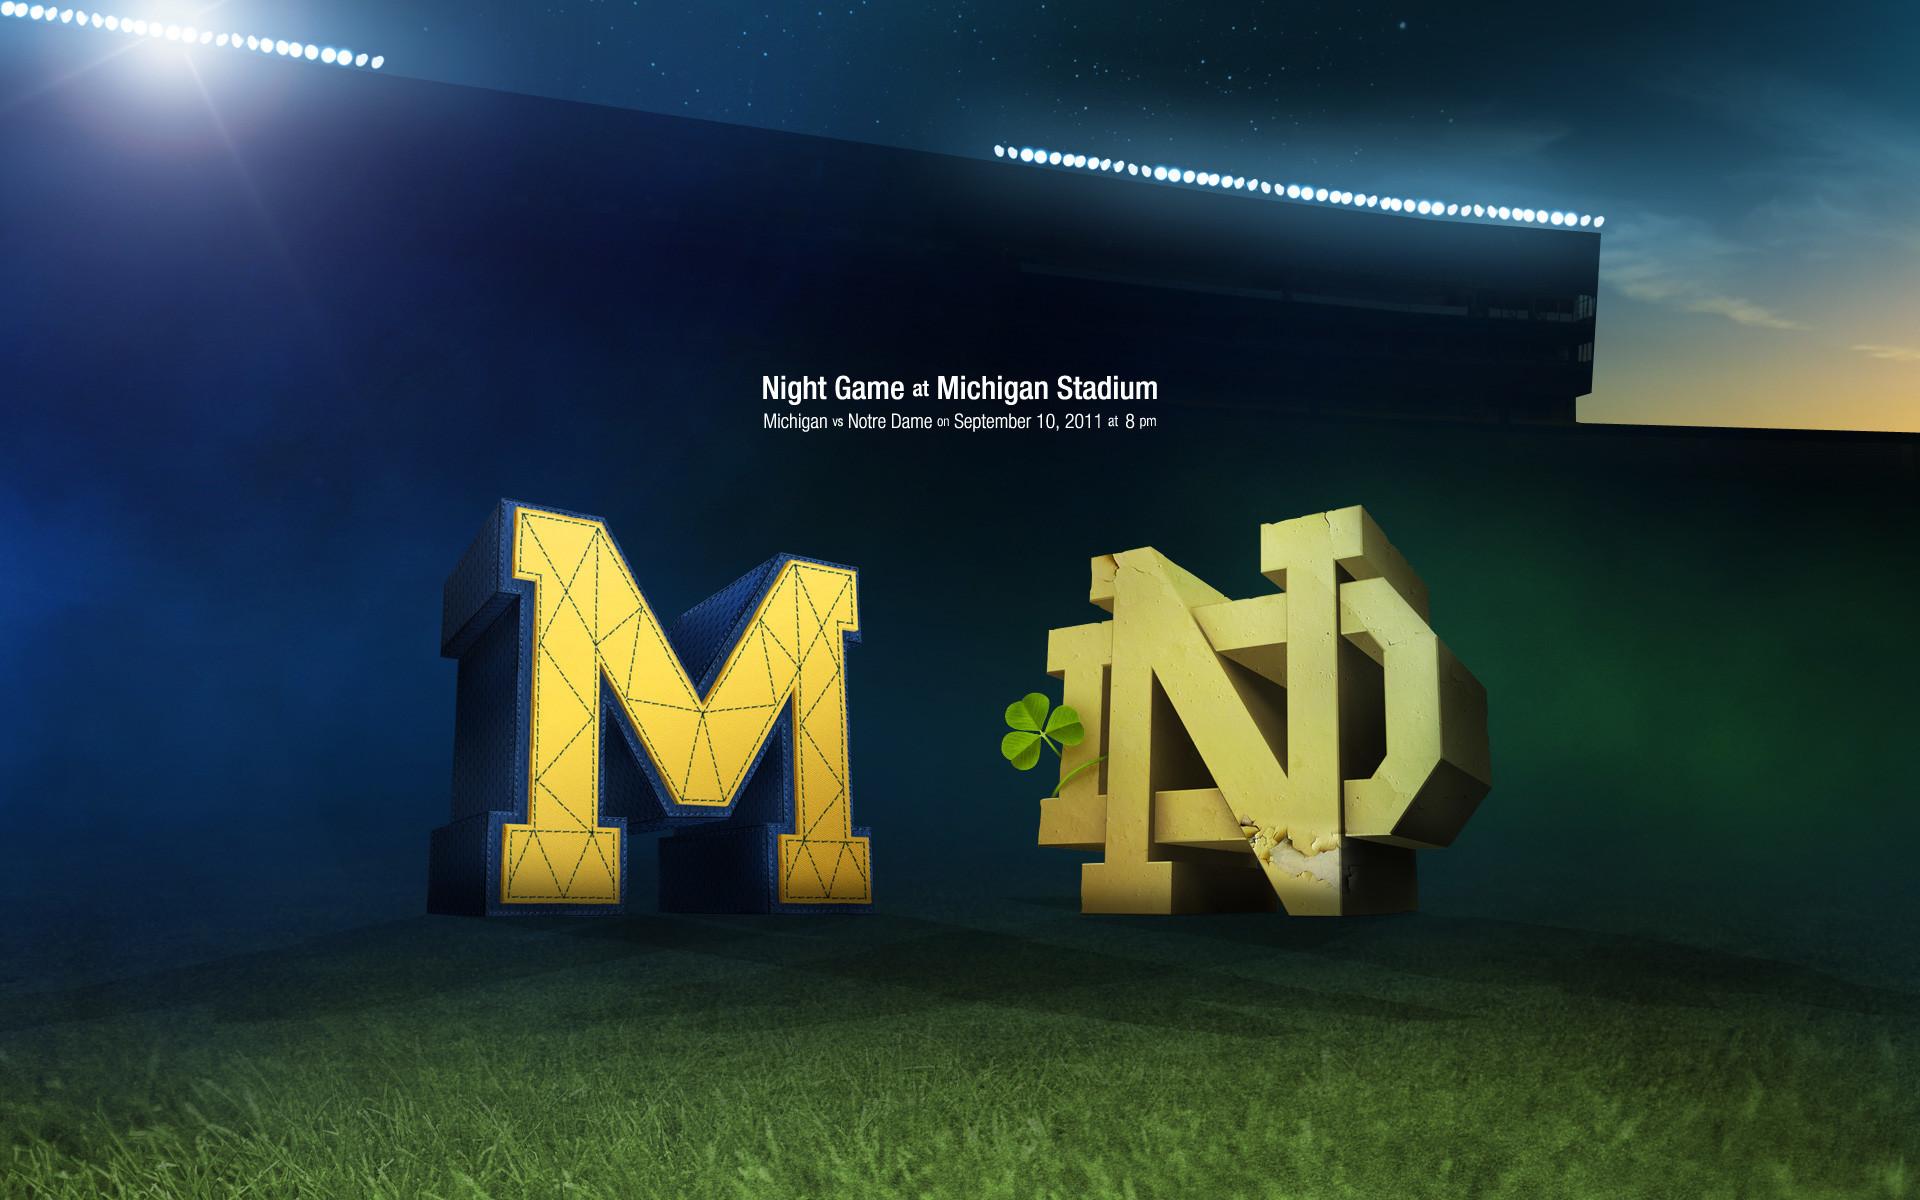 Michigan Football Wallpaper 2011 wallpaper – 553738